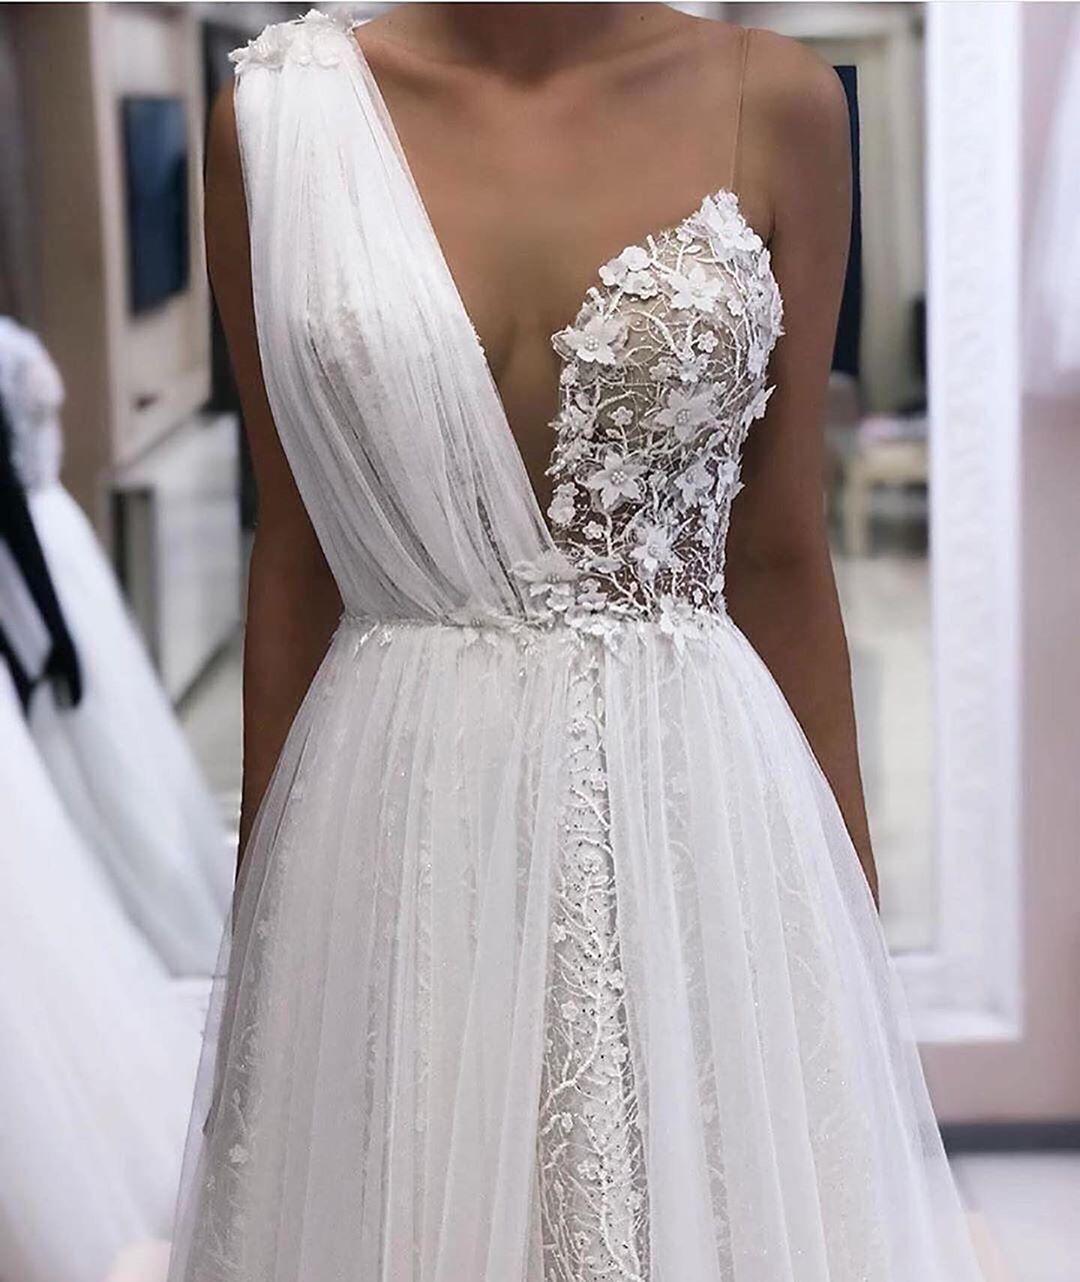 20,20 ?????????, 20 ?????????? – Dresses Exclusive ...